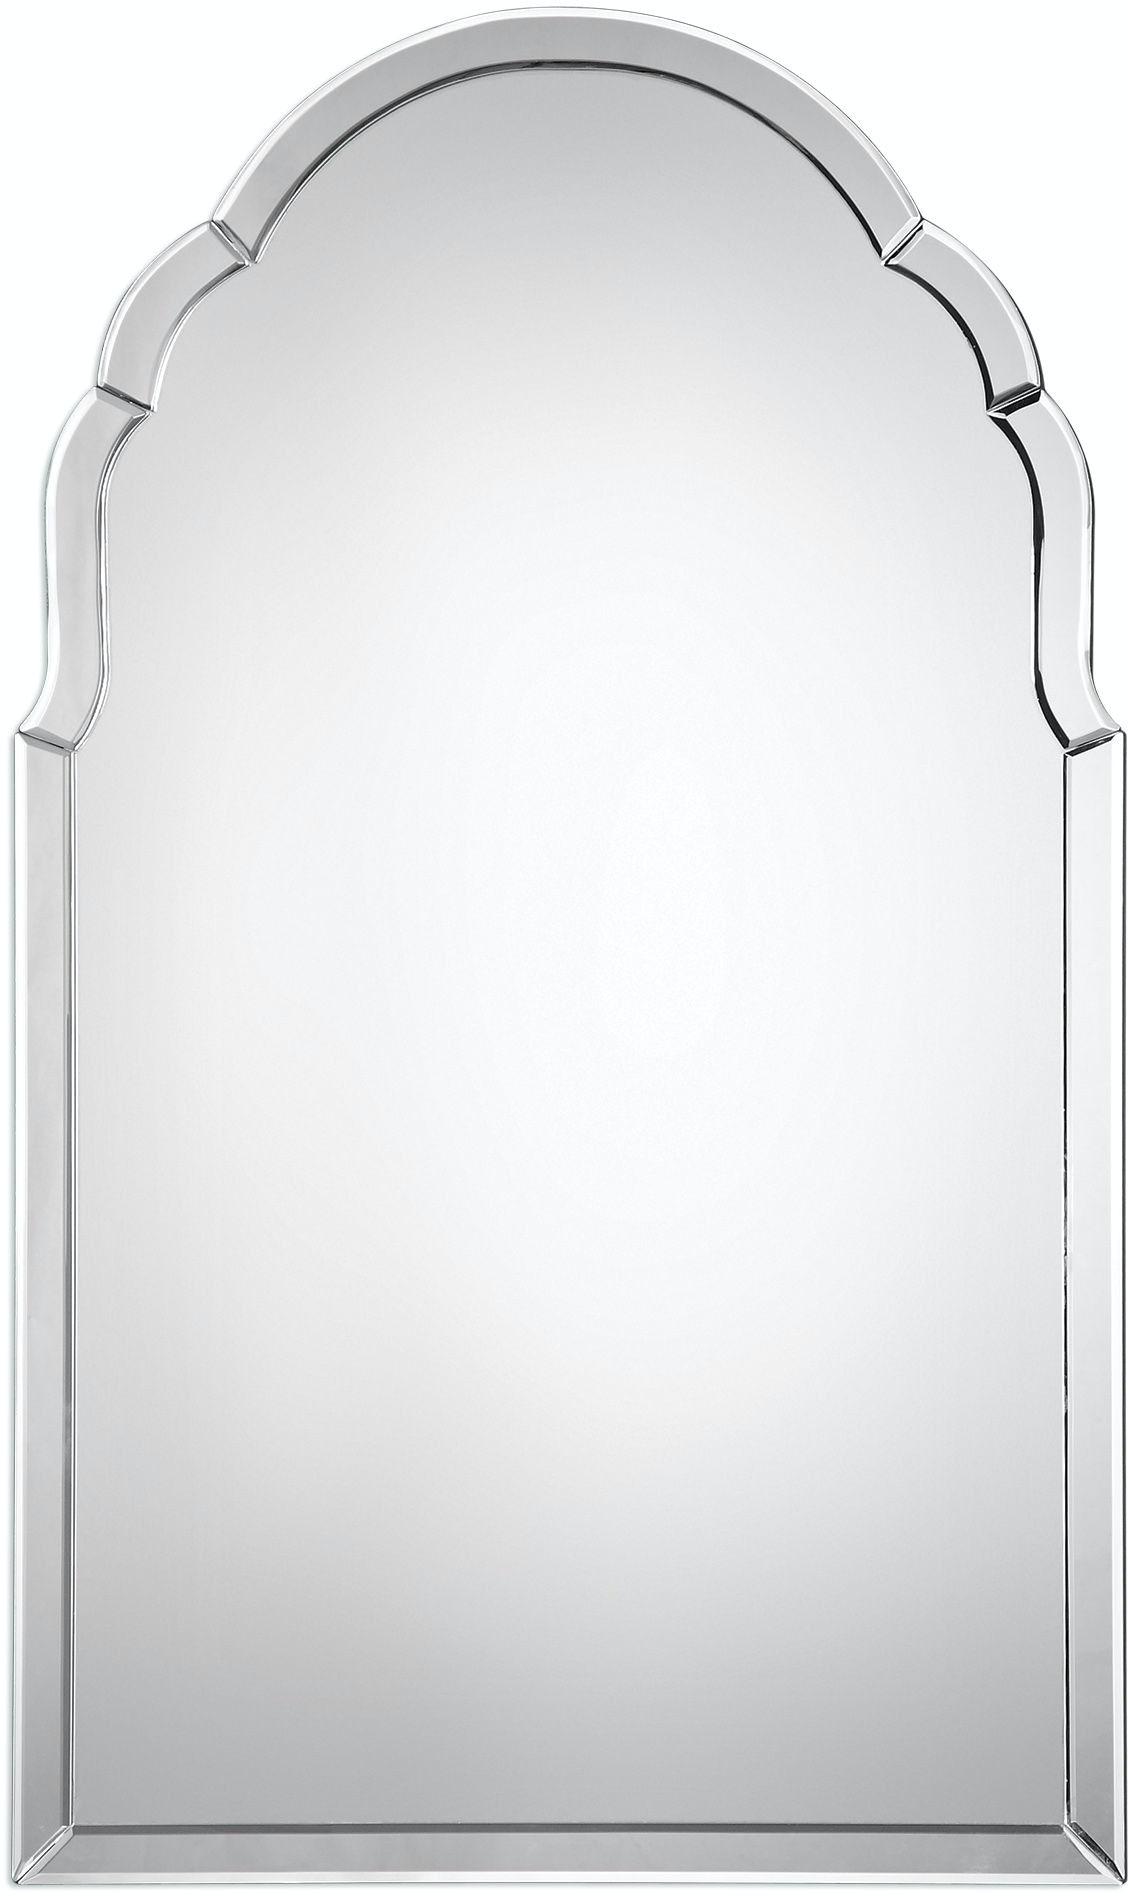 Uttermost Bedroom Brayden Frameless Arched Mirror 09149